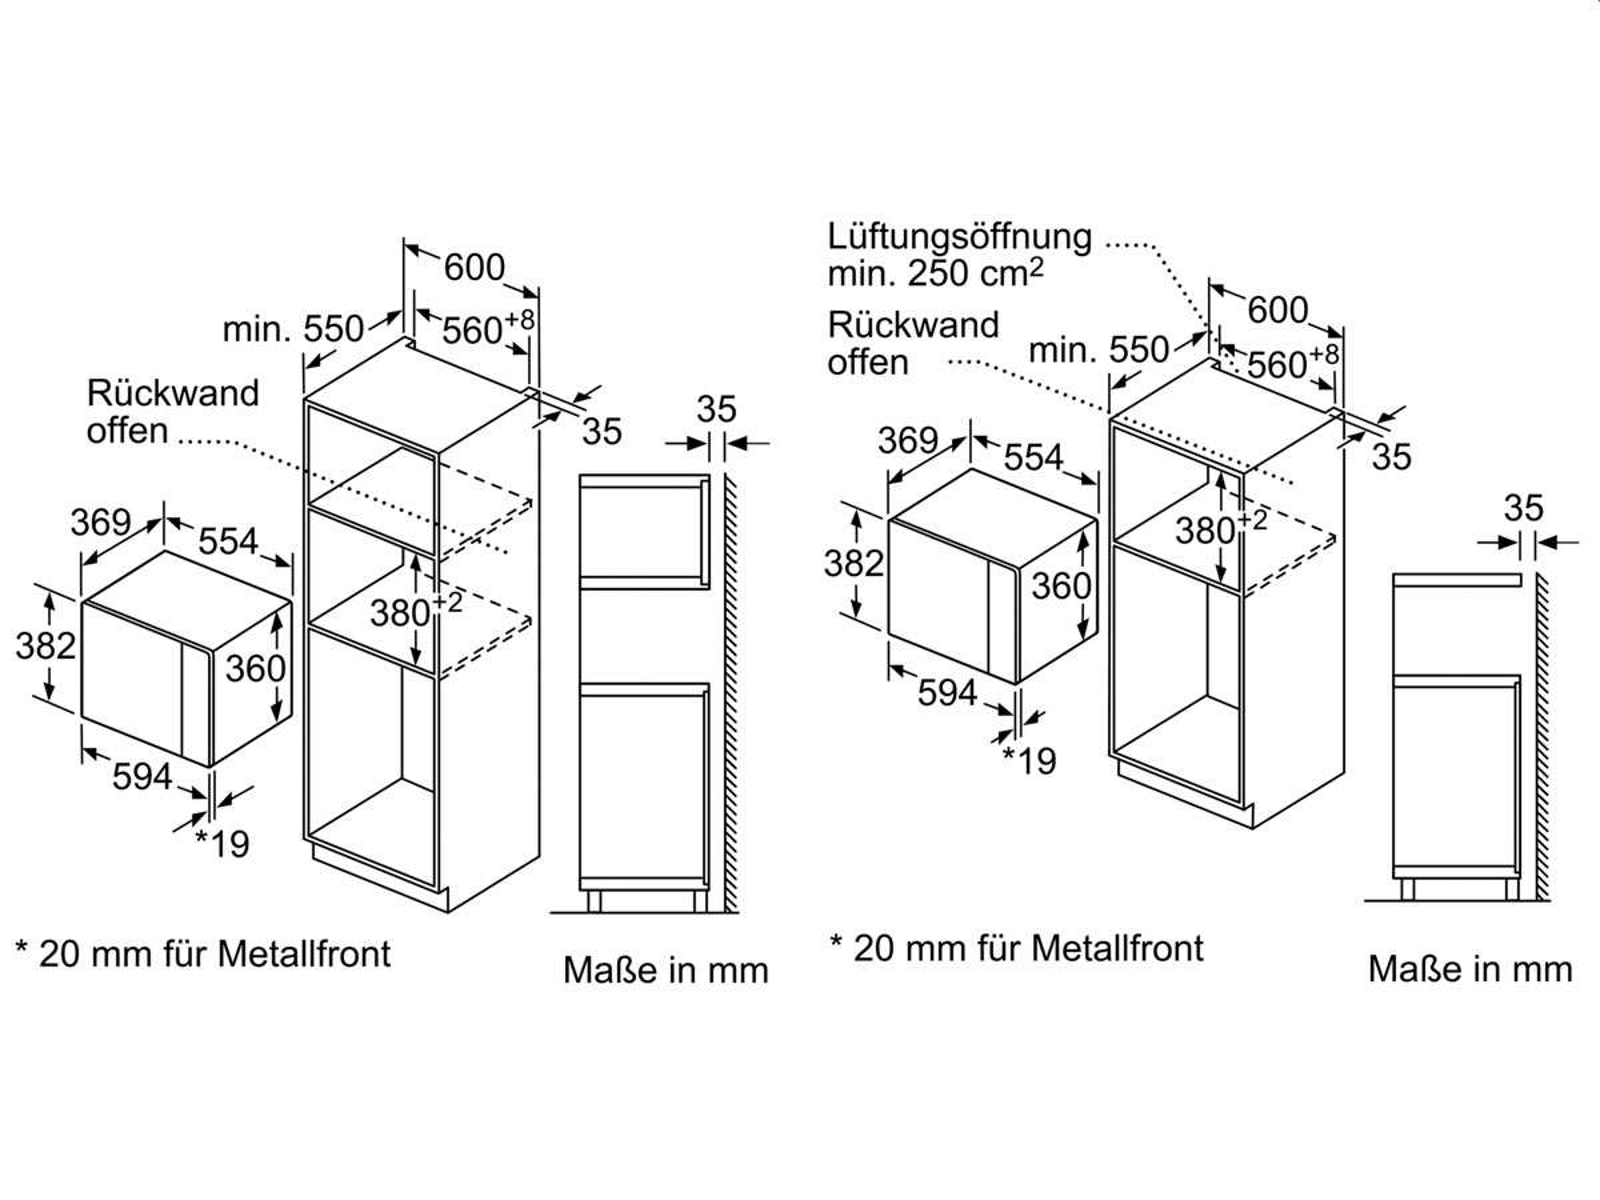 neff hwb53 einbau mikrowelle edelstahl. Black Bedroom Furniture Sets. Home Design Ideas